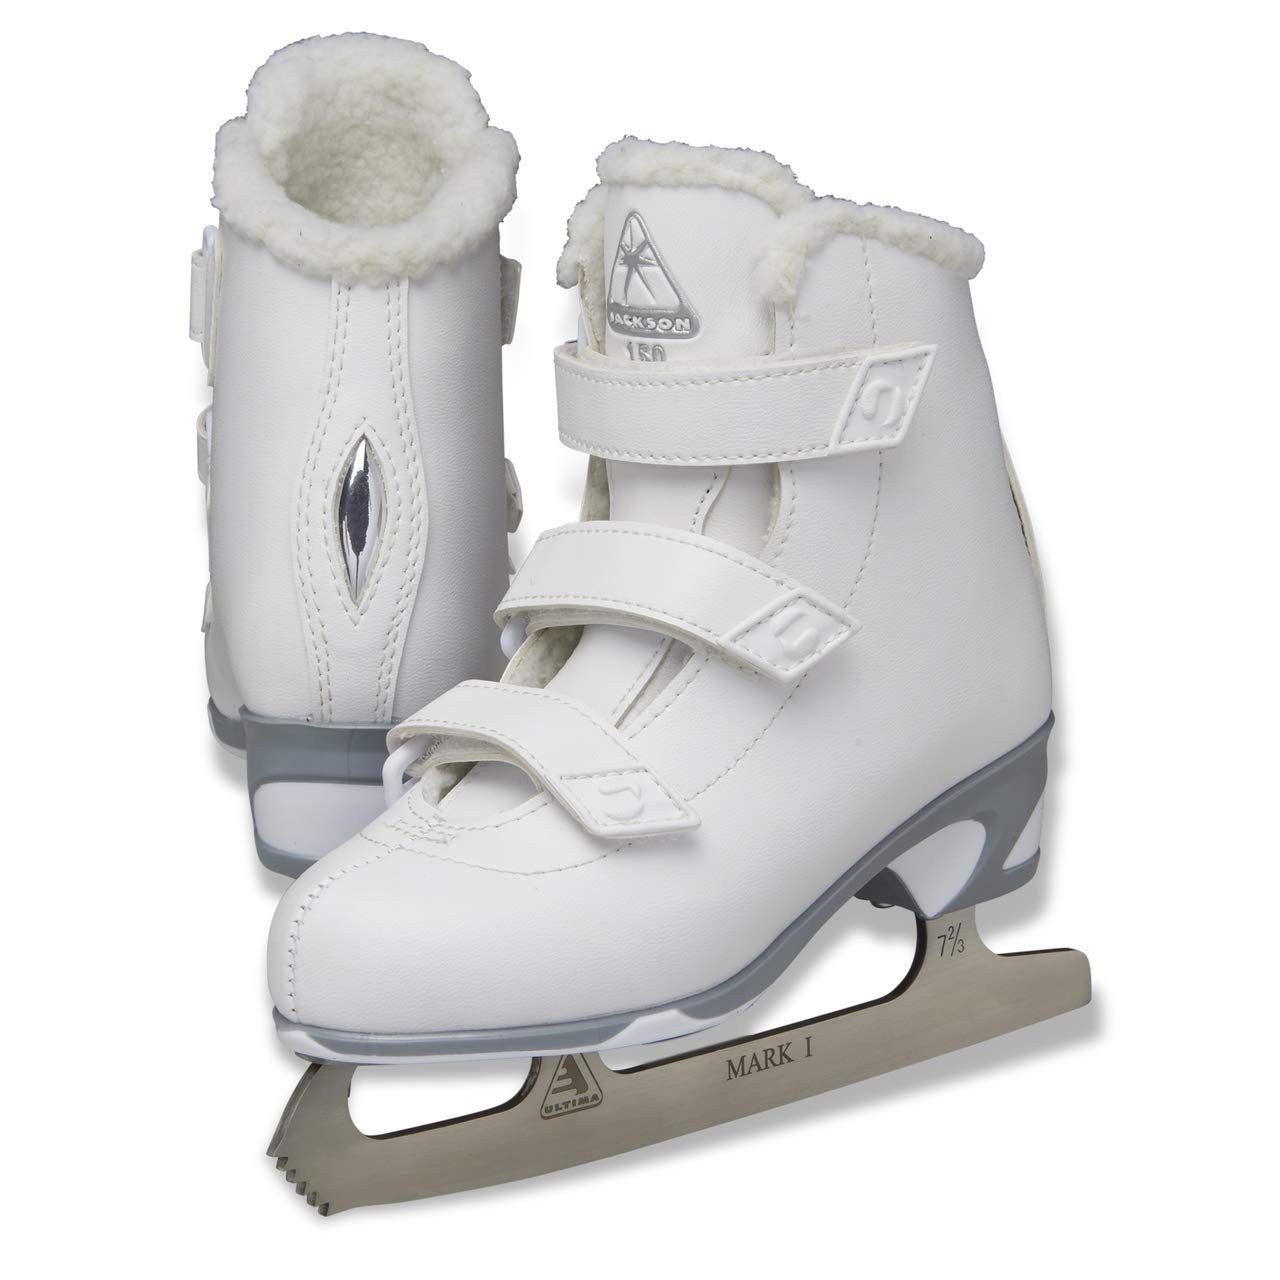 NEW Jackson Misses/' JS151 Girls/' Figure Skates with Mark I Blades White